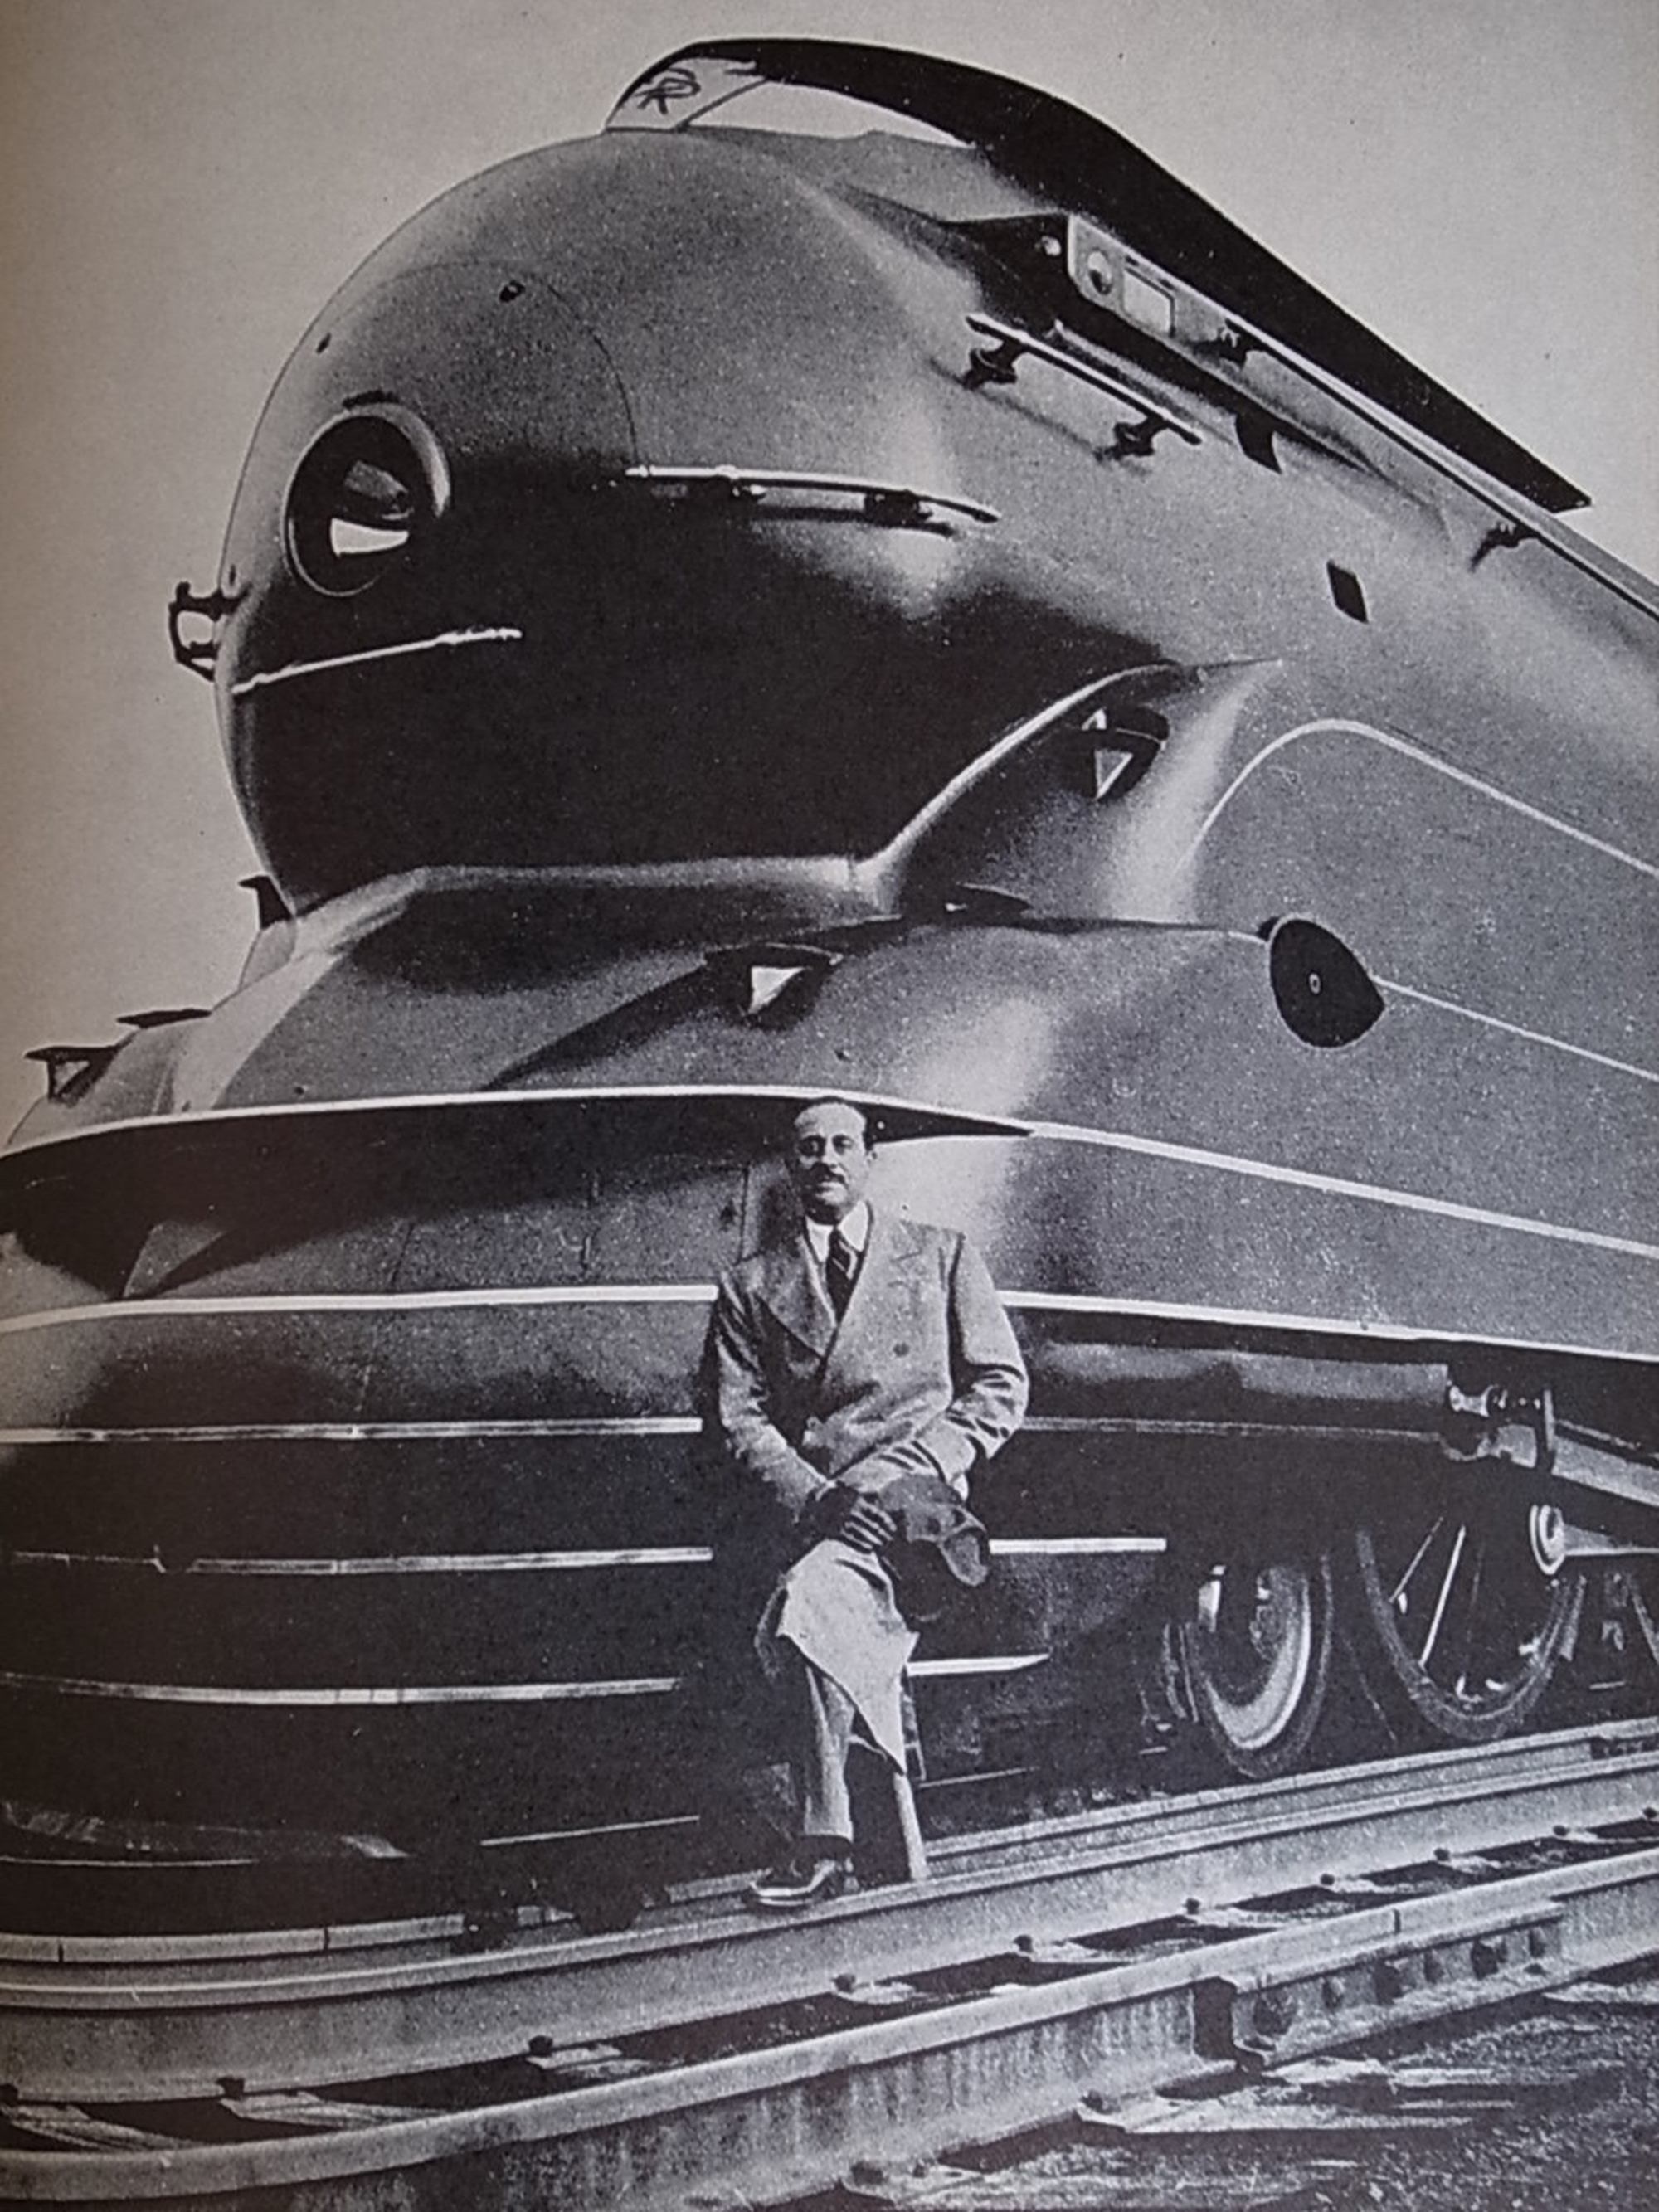 Loewy on the S-1 steam locomotive